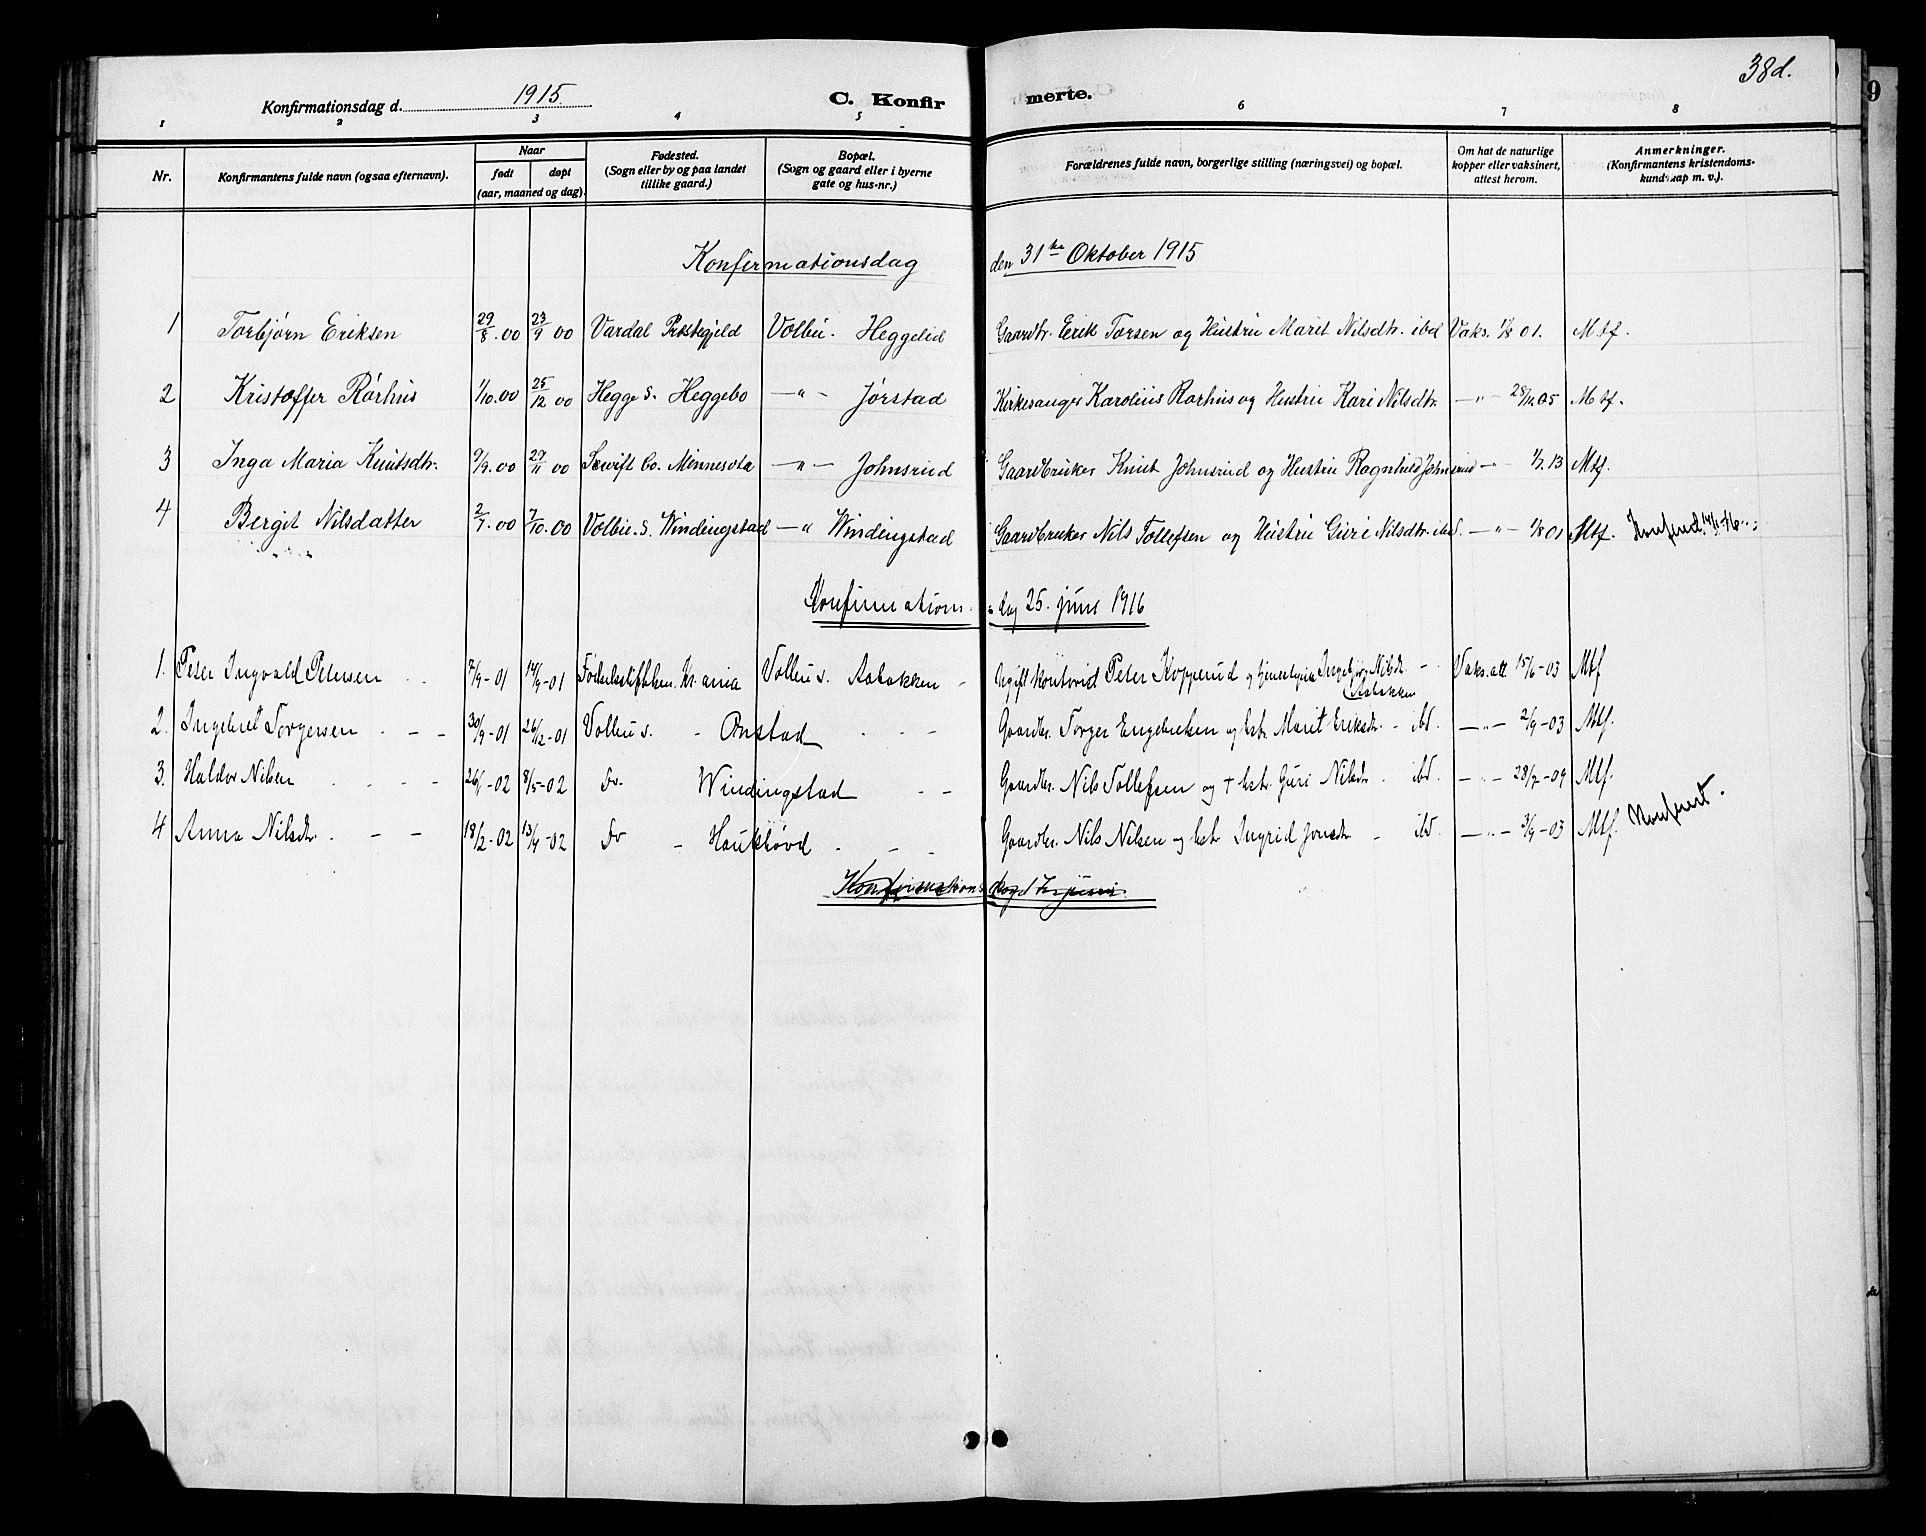 SAH, Øystre Slidre prestekontor, Klokkerbok nr. 6, 1887-1916, s. 38d